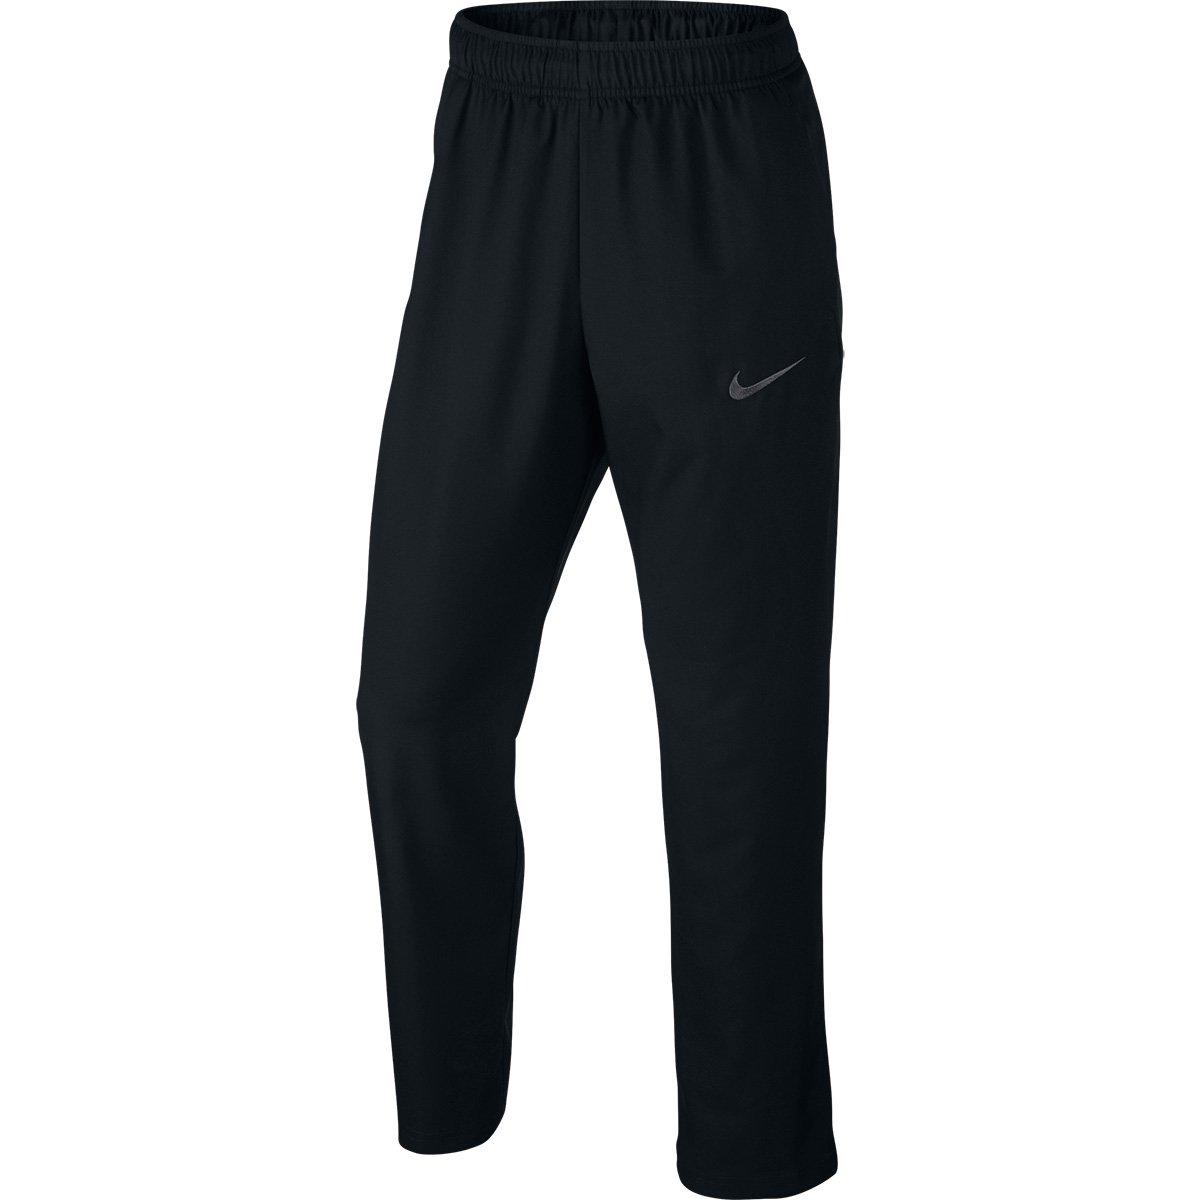 Calça Nike Dry Team Masculina